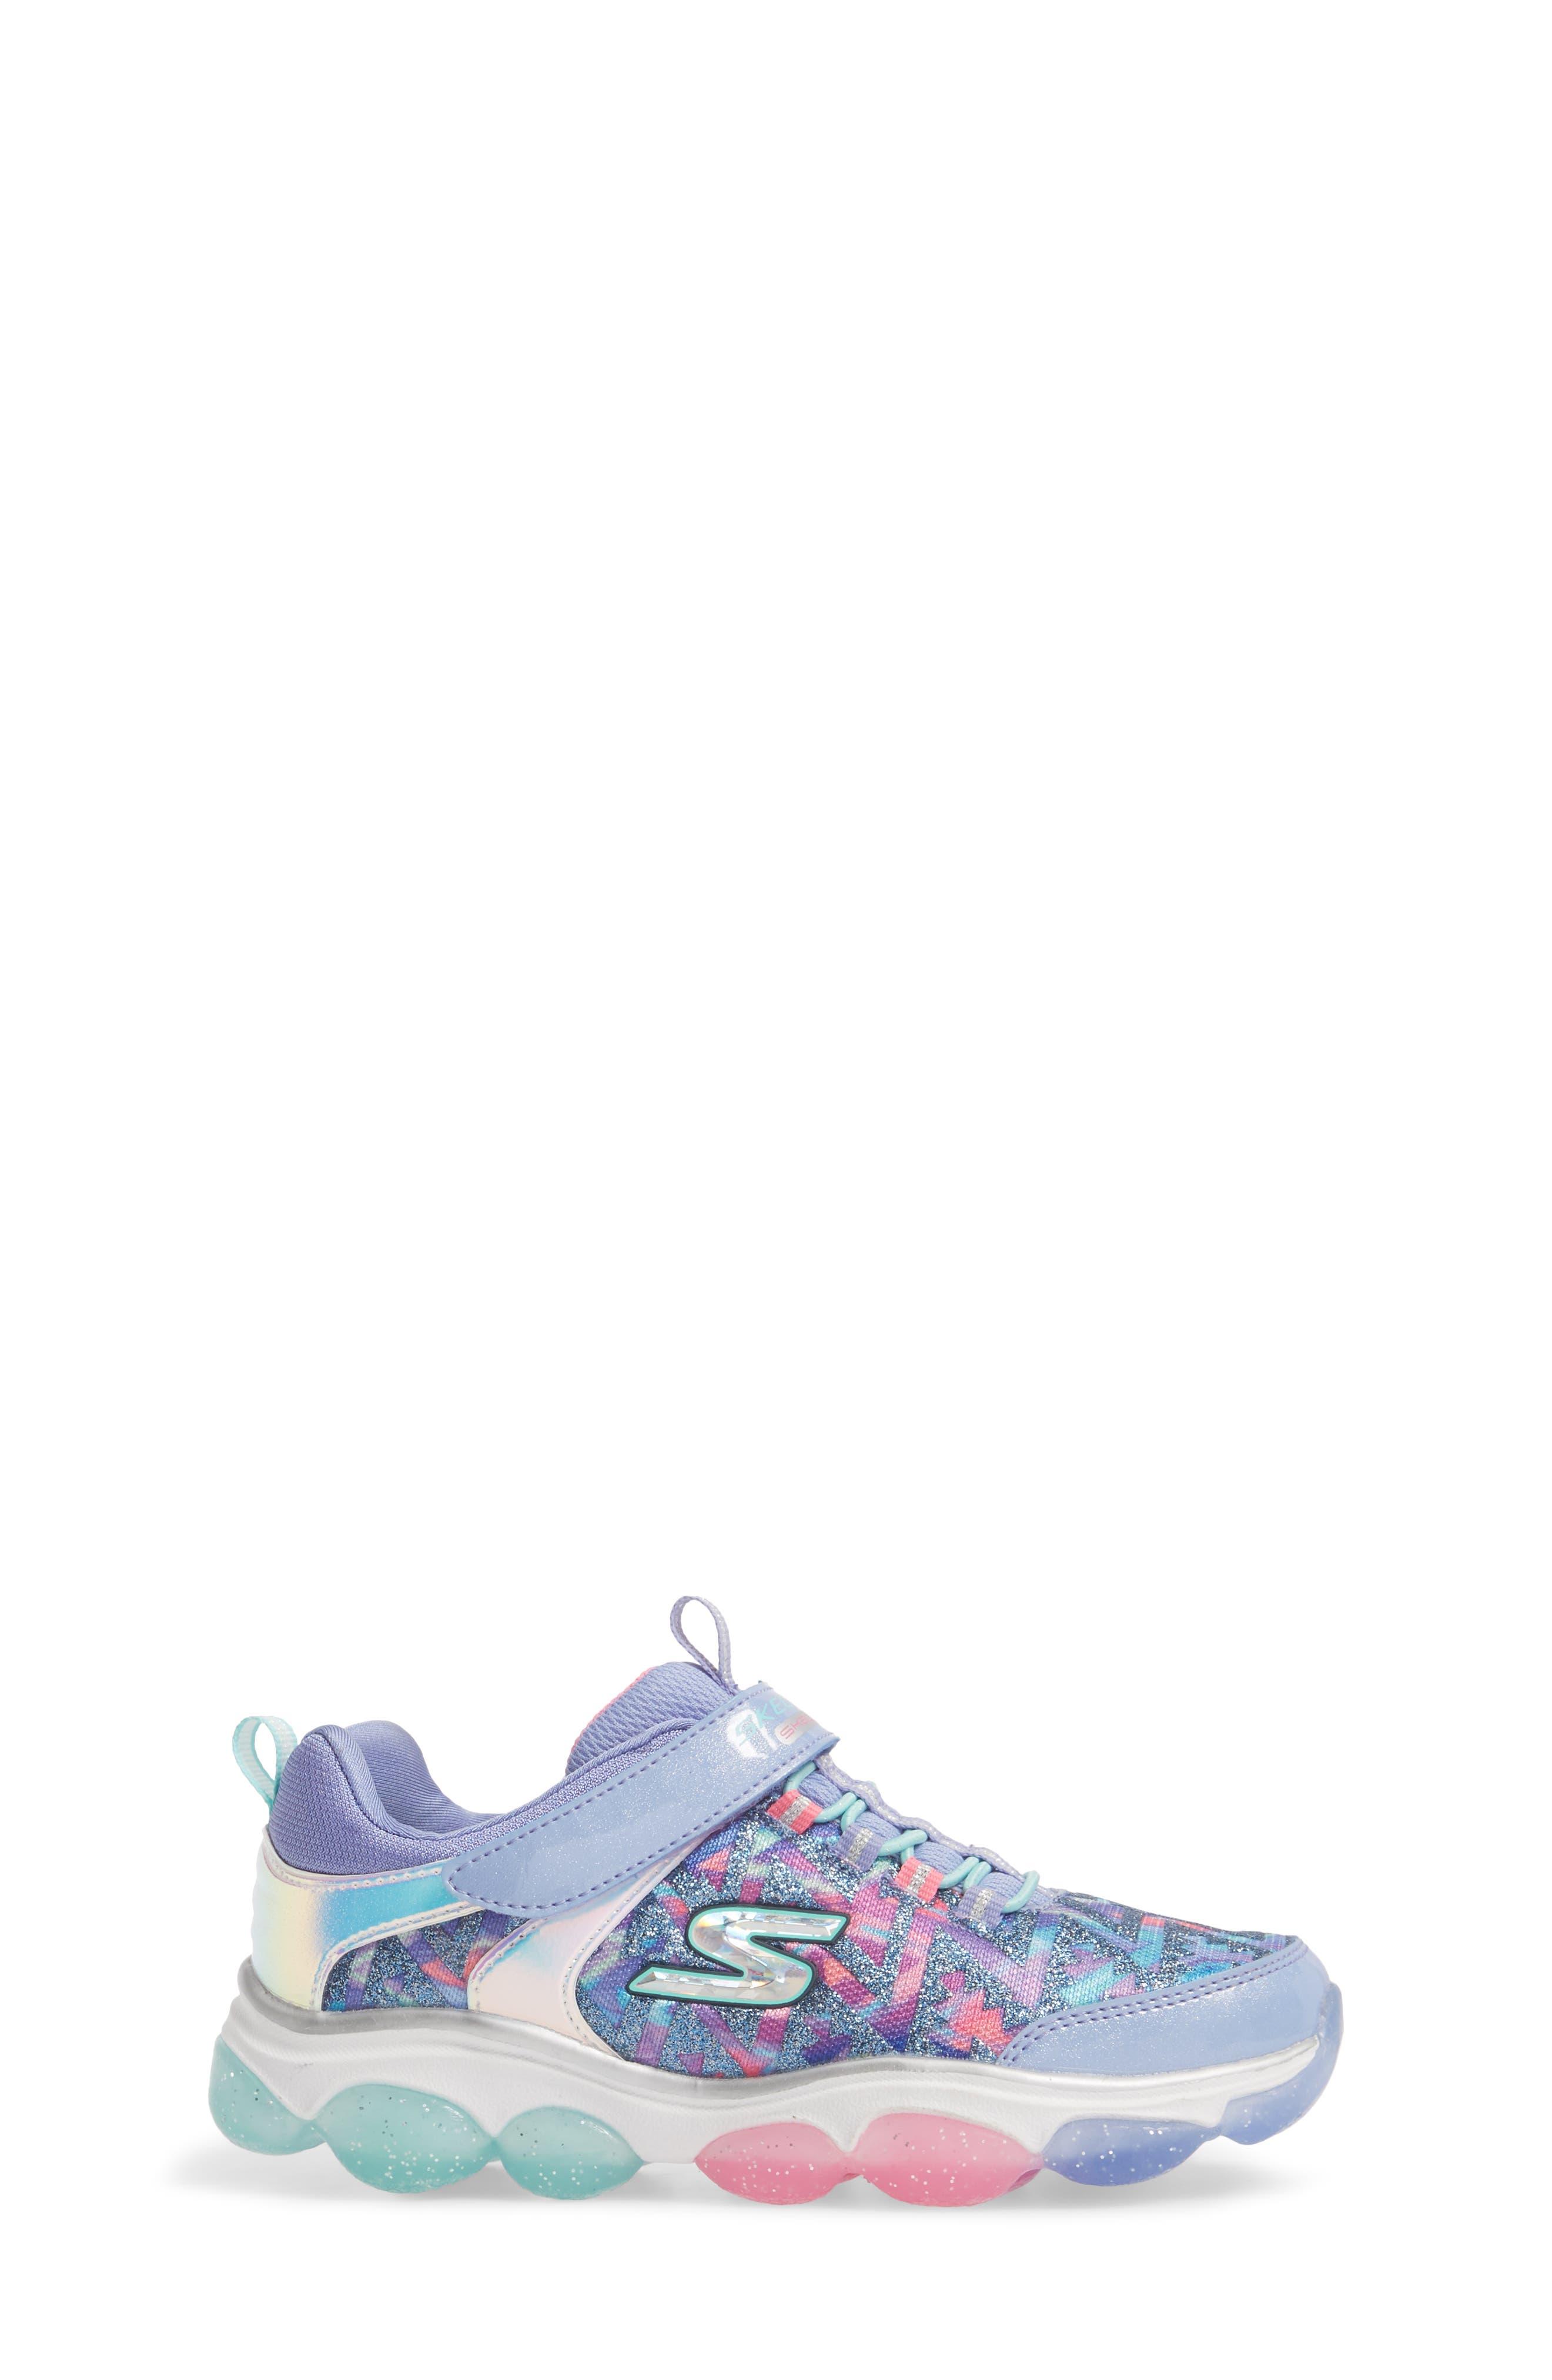 Skech-Air Groove Glitter N Go Sneakers,                             Alternate thumbnail 3, color,                             500